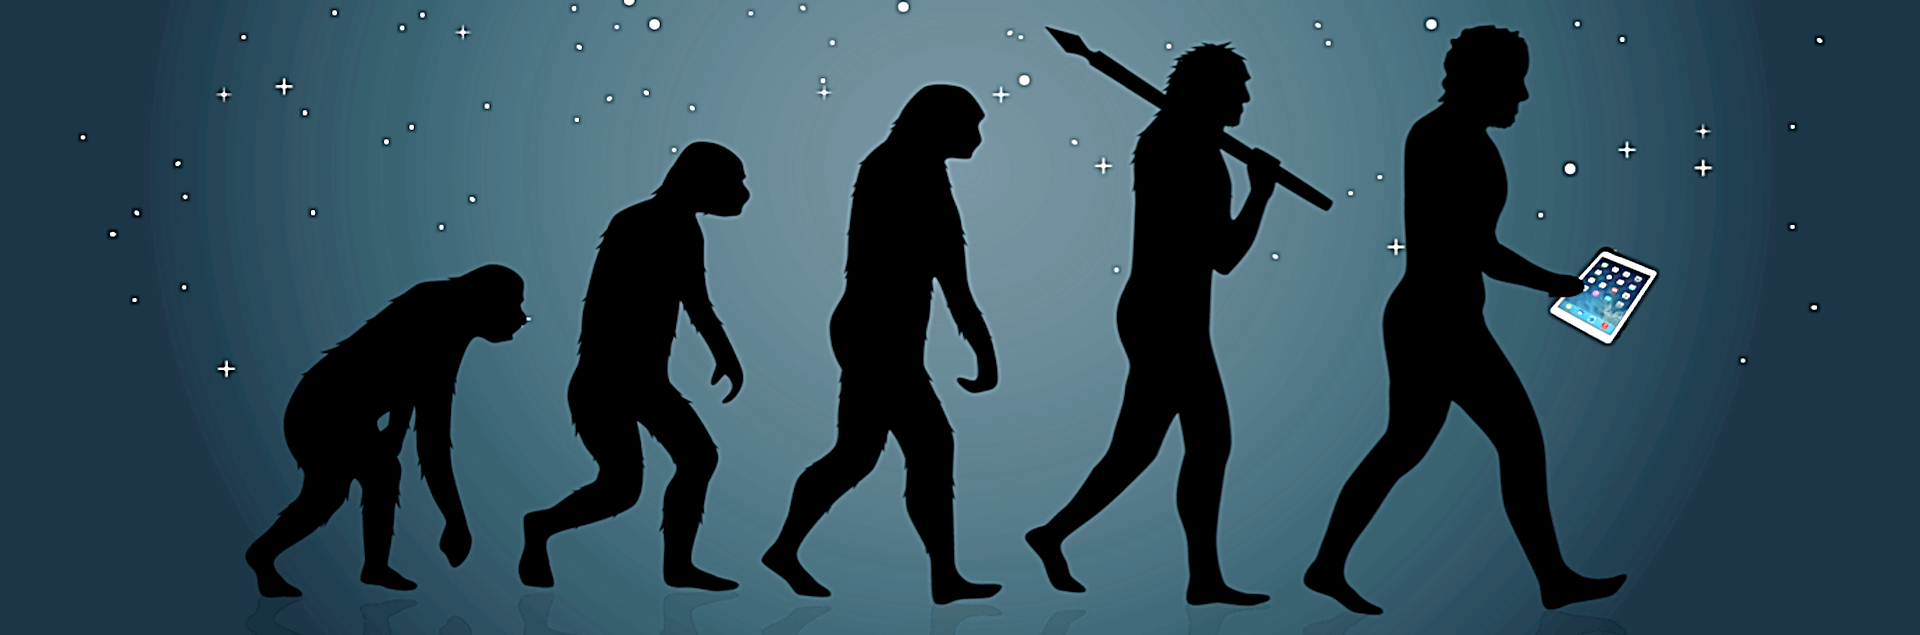 Digital Darwin evolution wipad wide banner -859409-edited.png